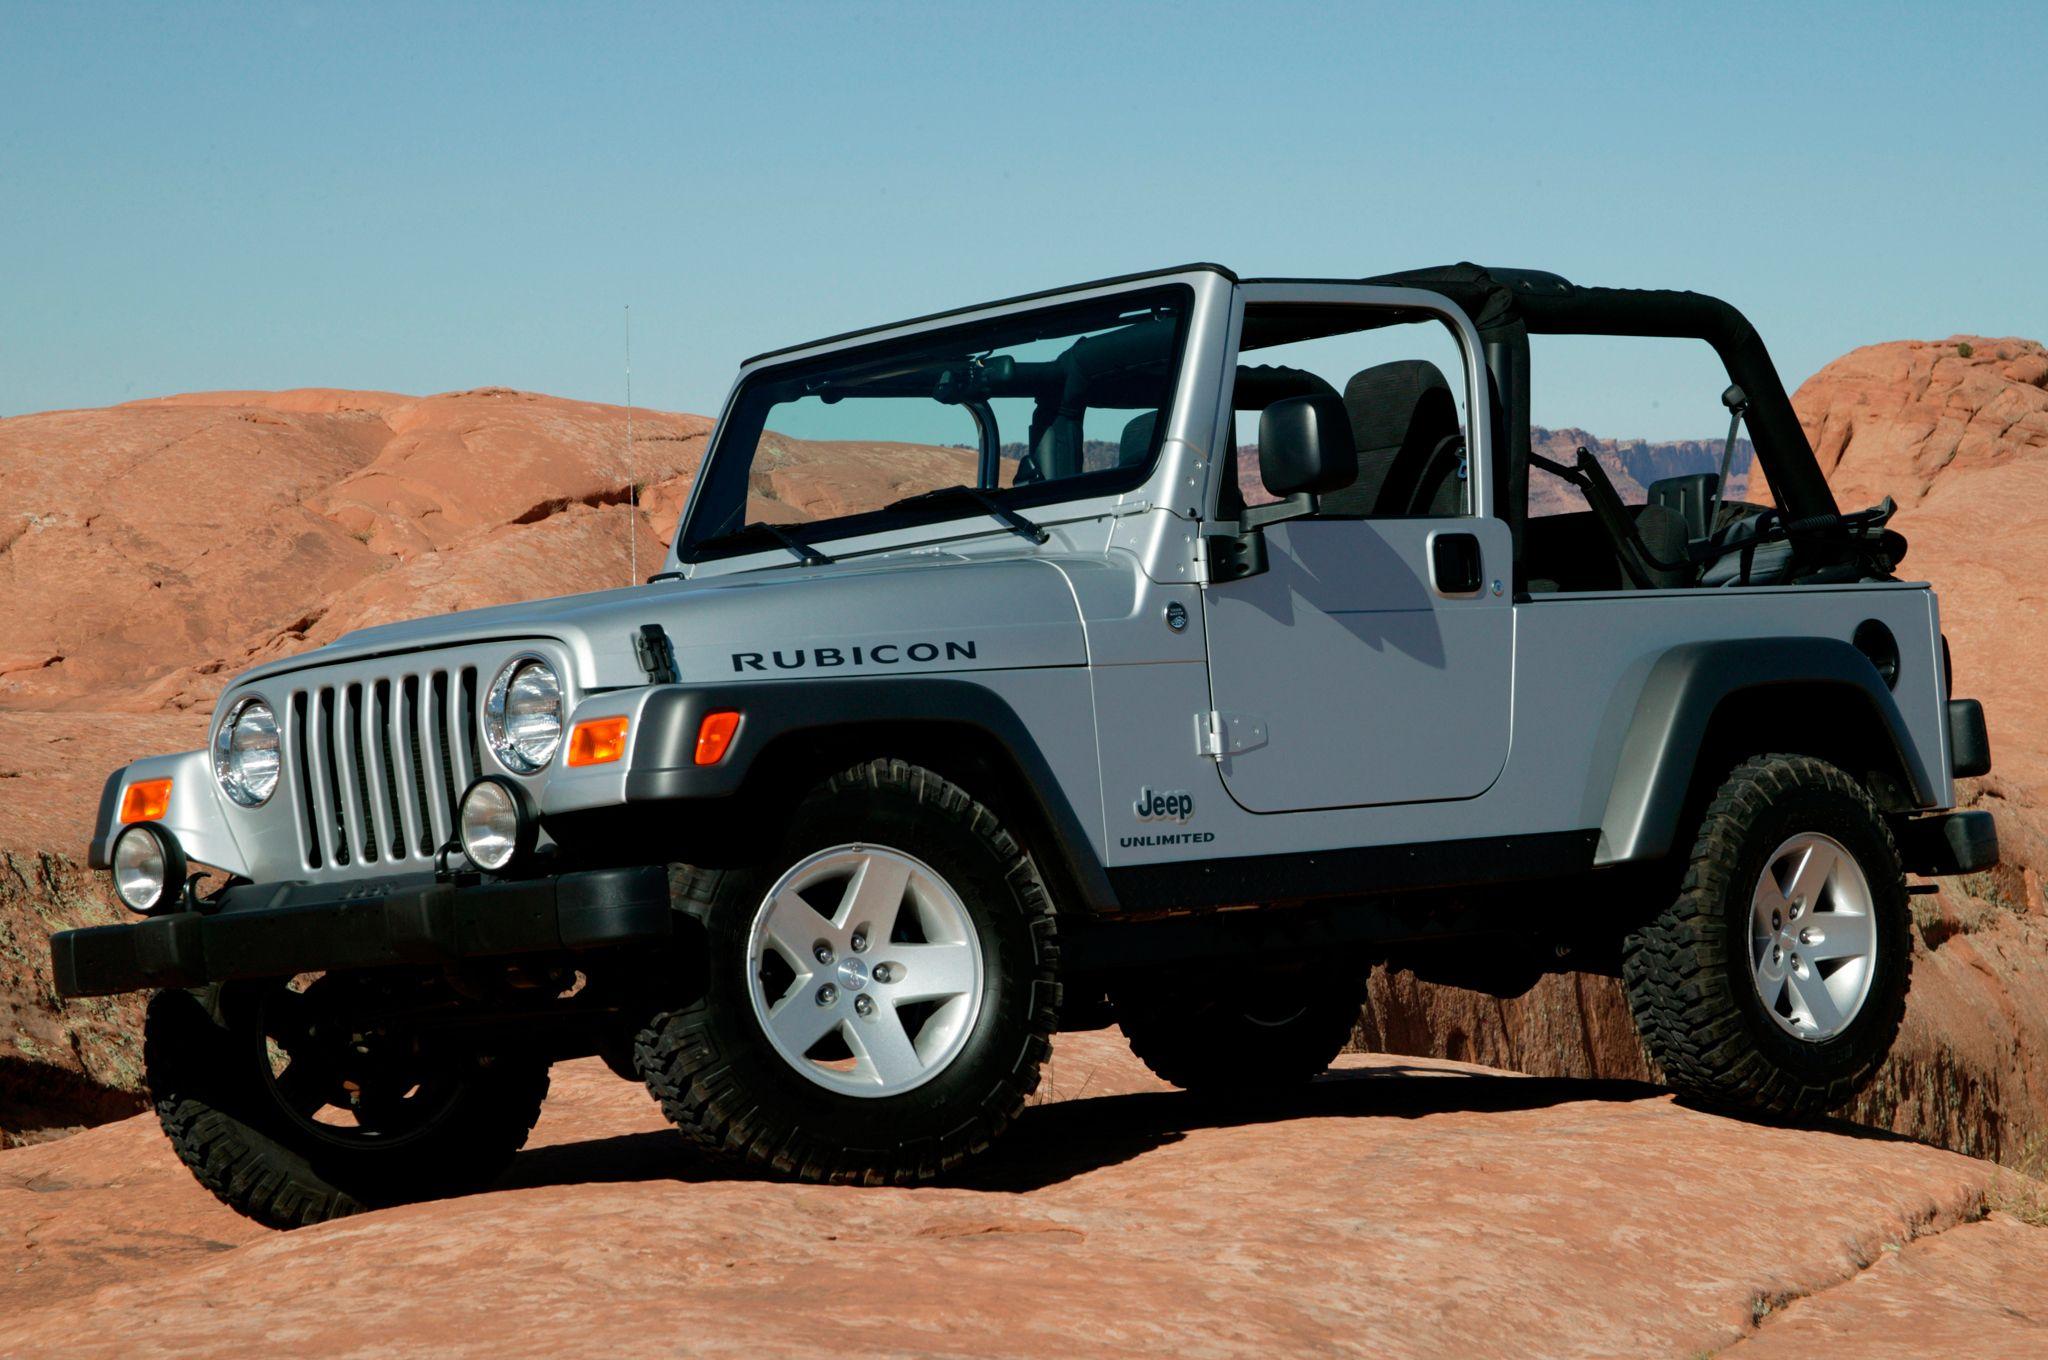 2006 jeep wrangler tj front three qaurters jeep wrangler tj 1997 2006 pinterest jeep wrangler tj 2006 jeep wrangler and wrangler tj